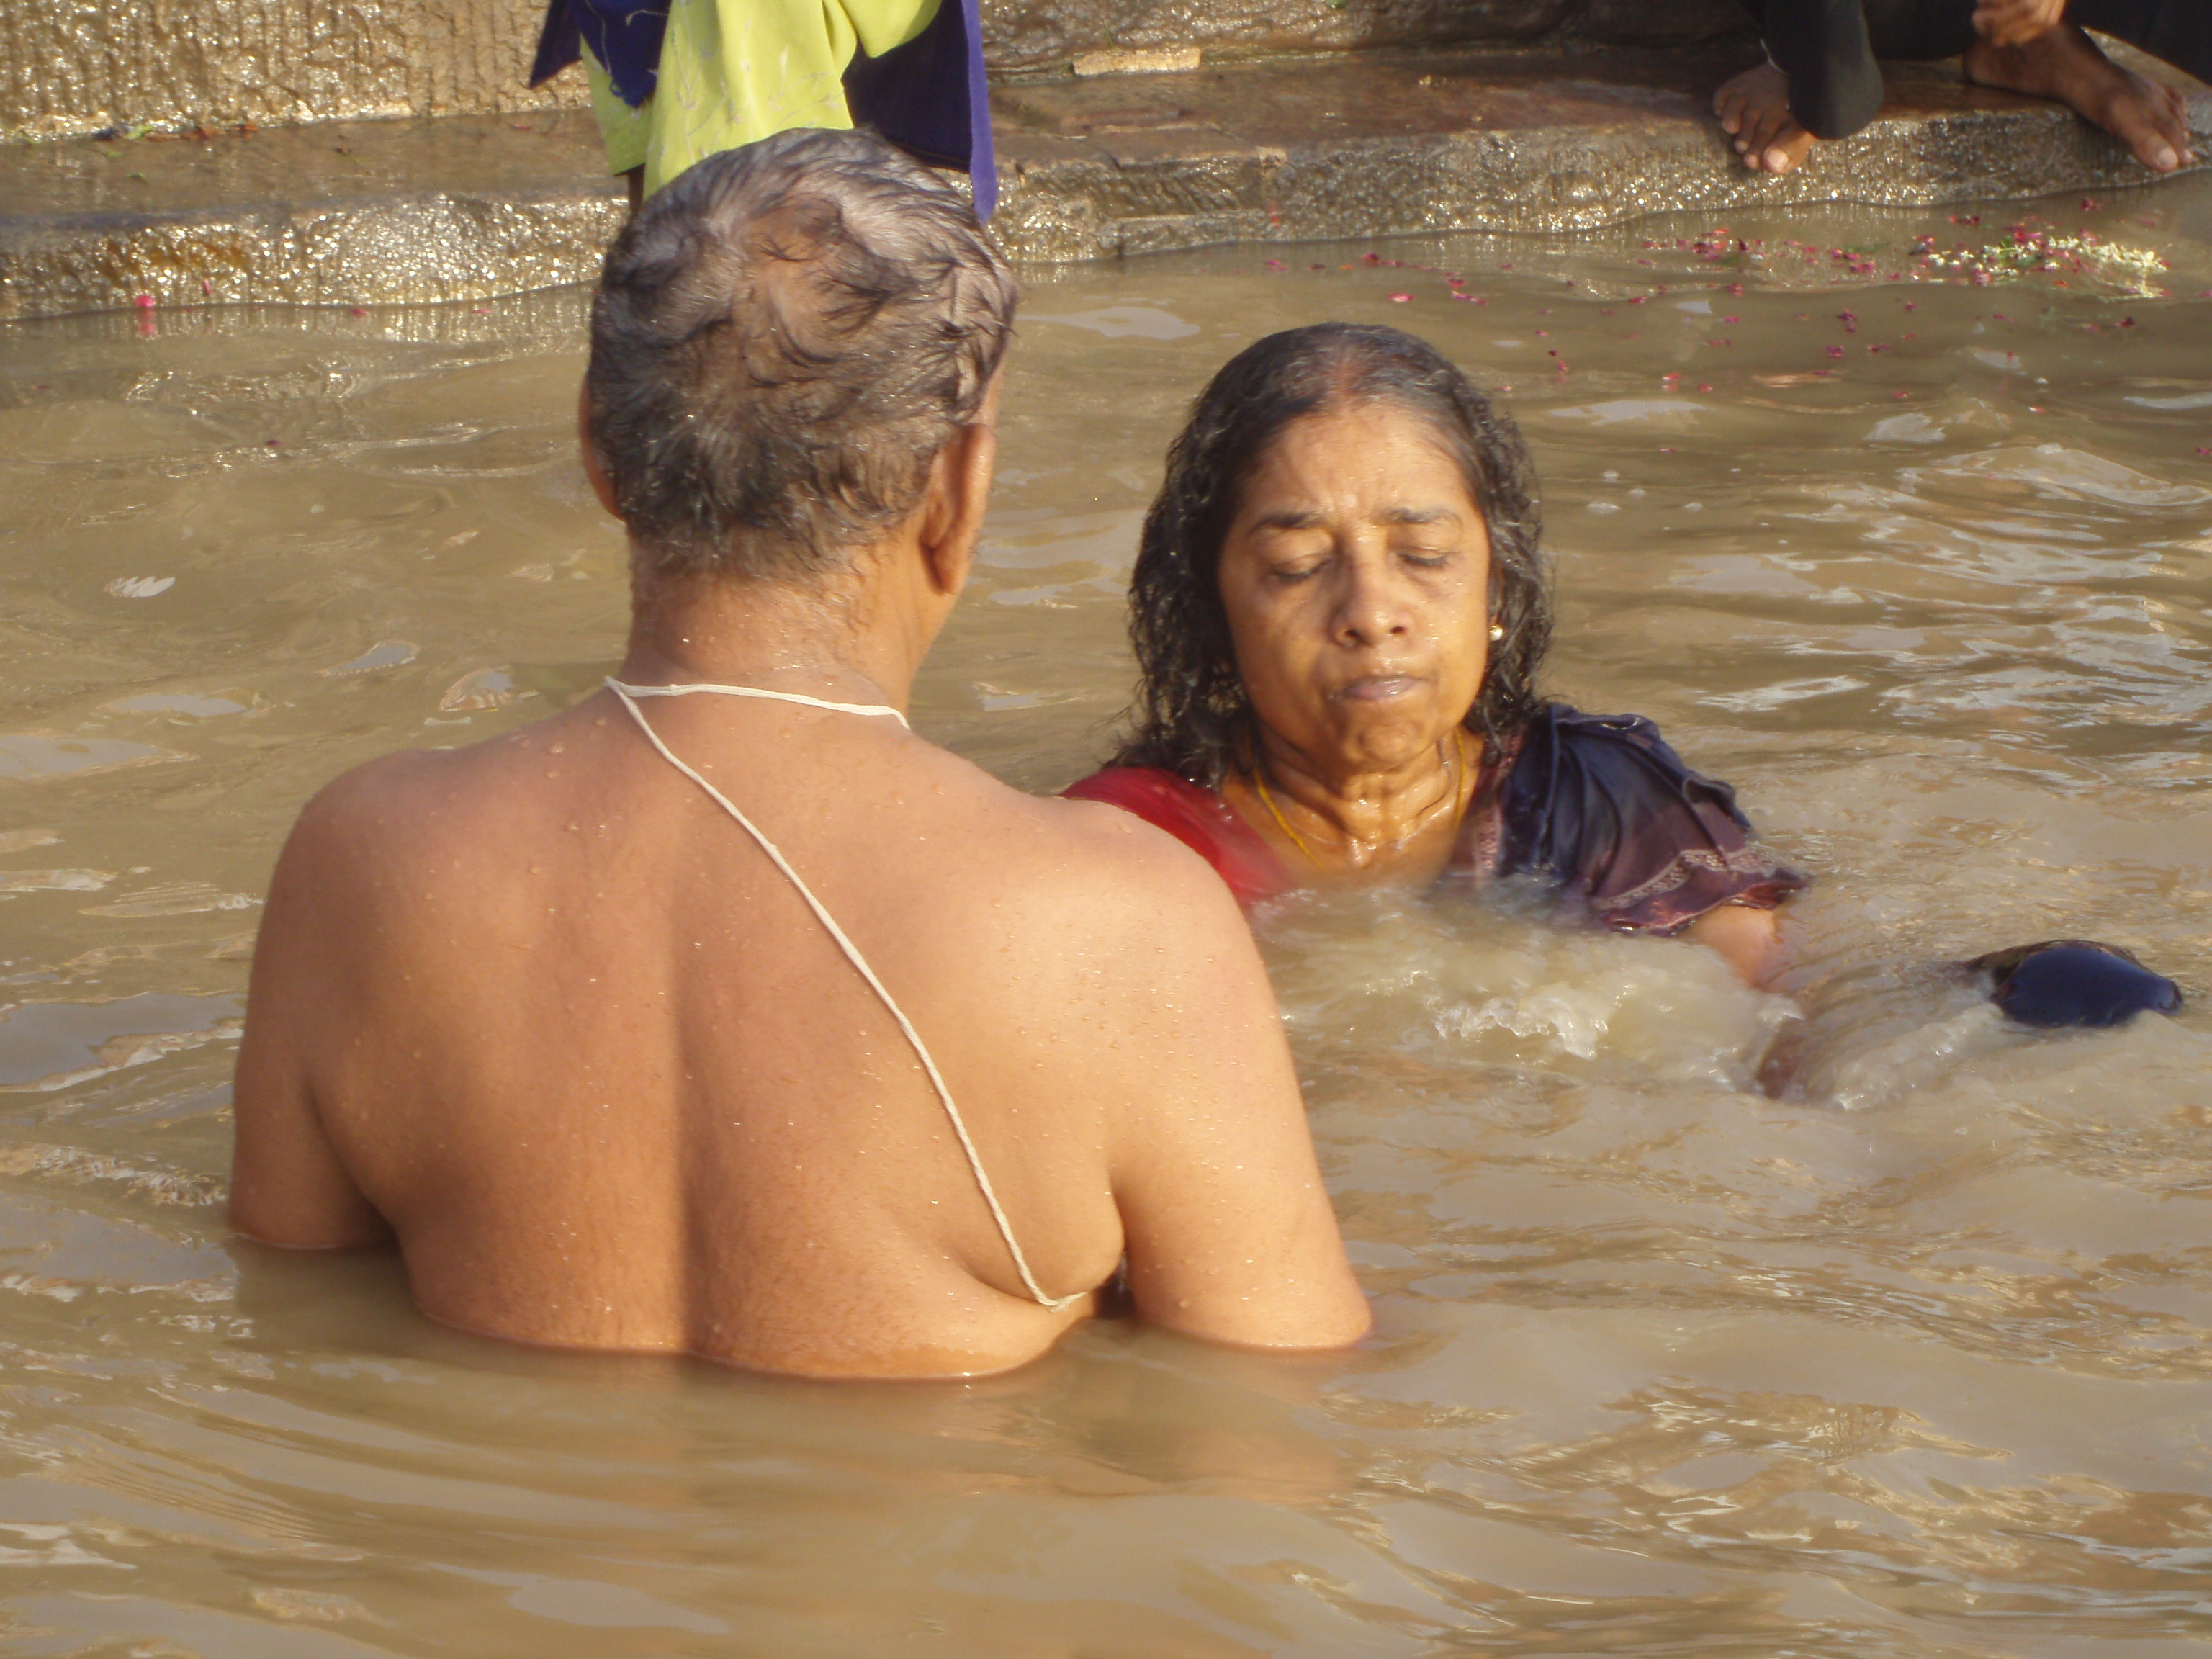 Abluciones en el Ganges @Doris Casares